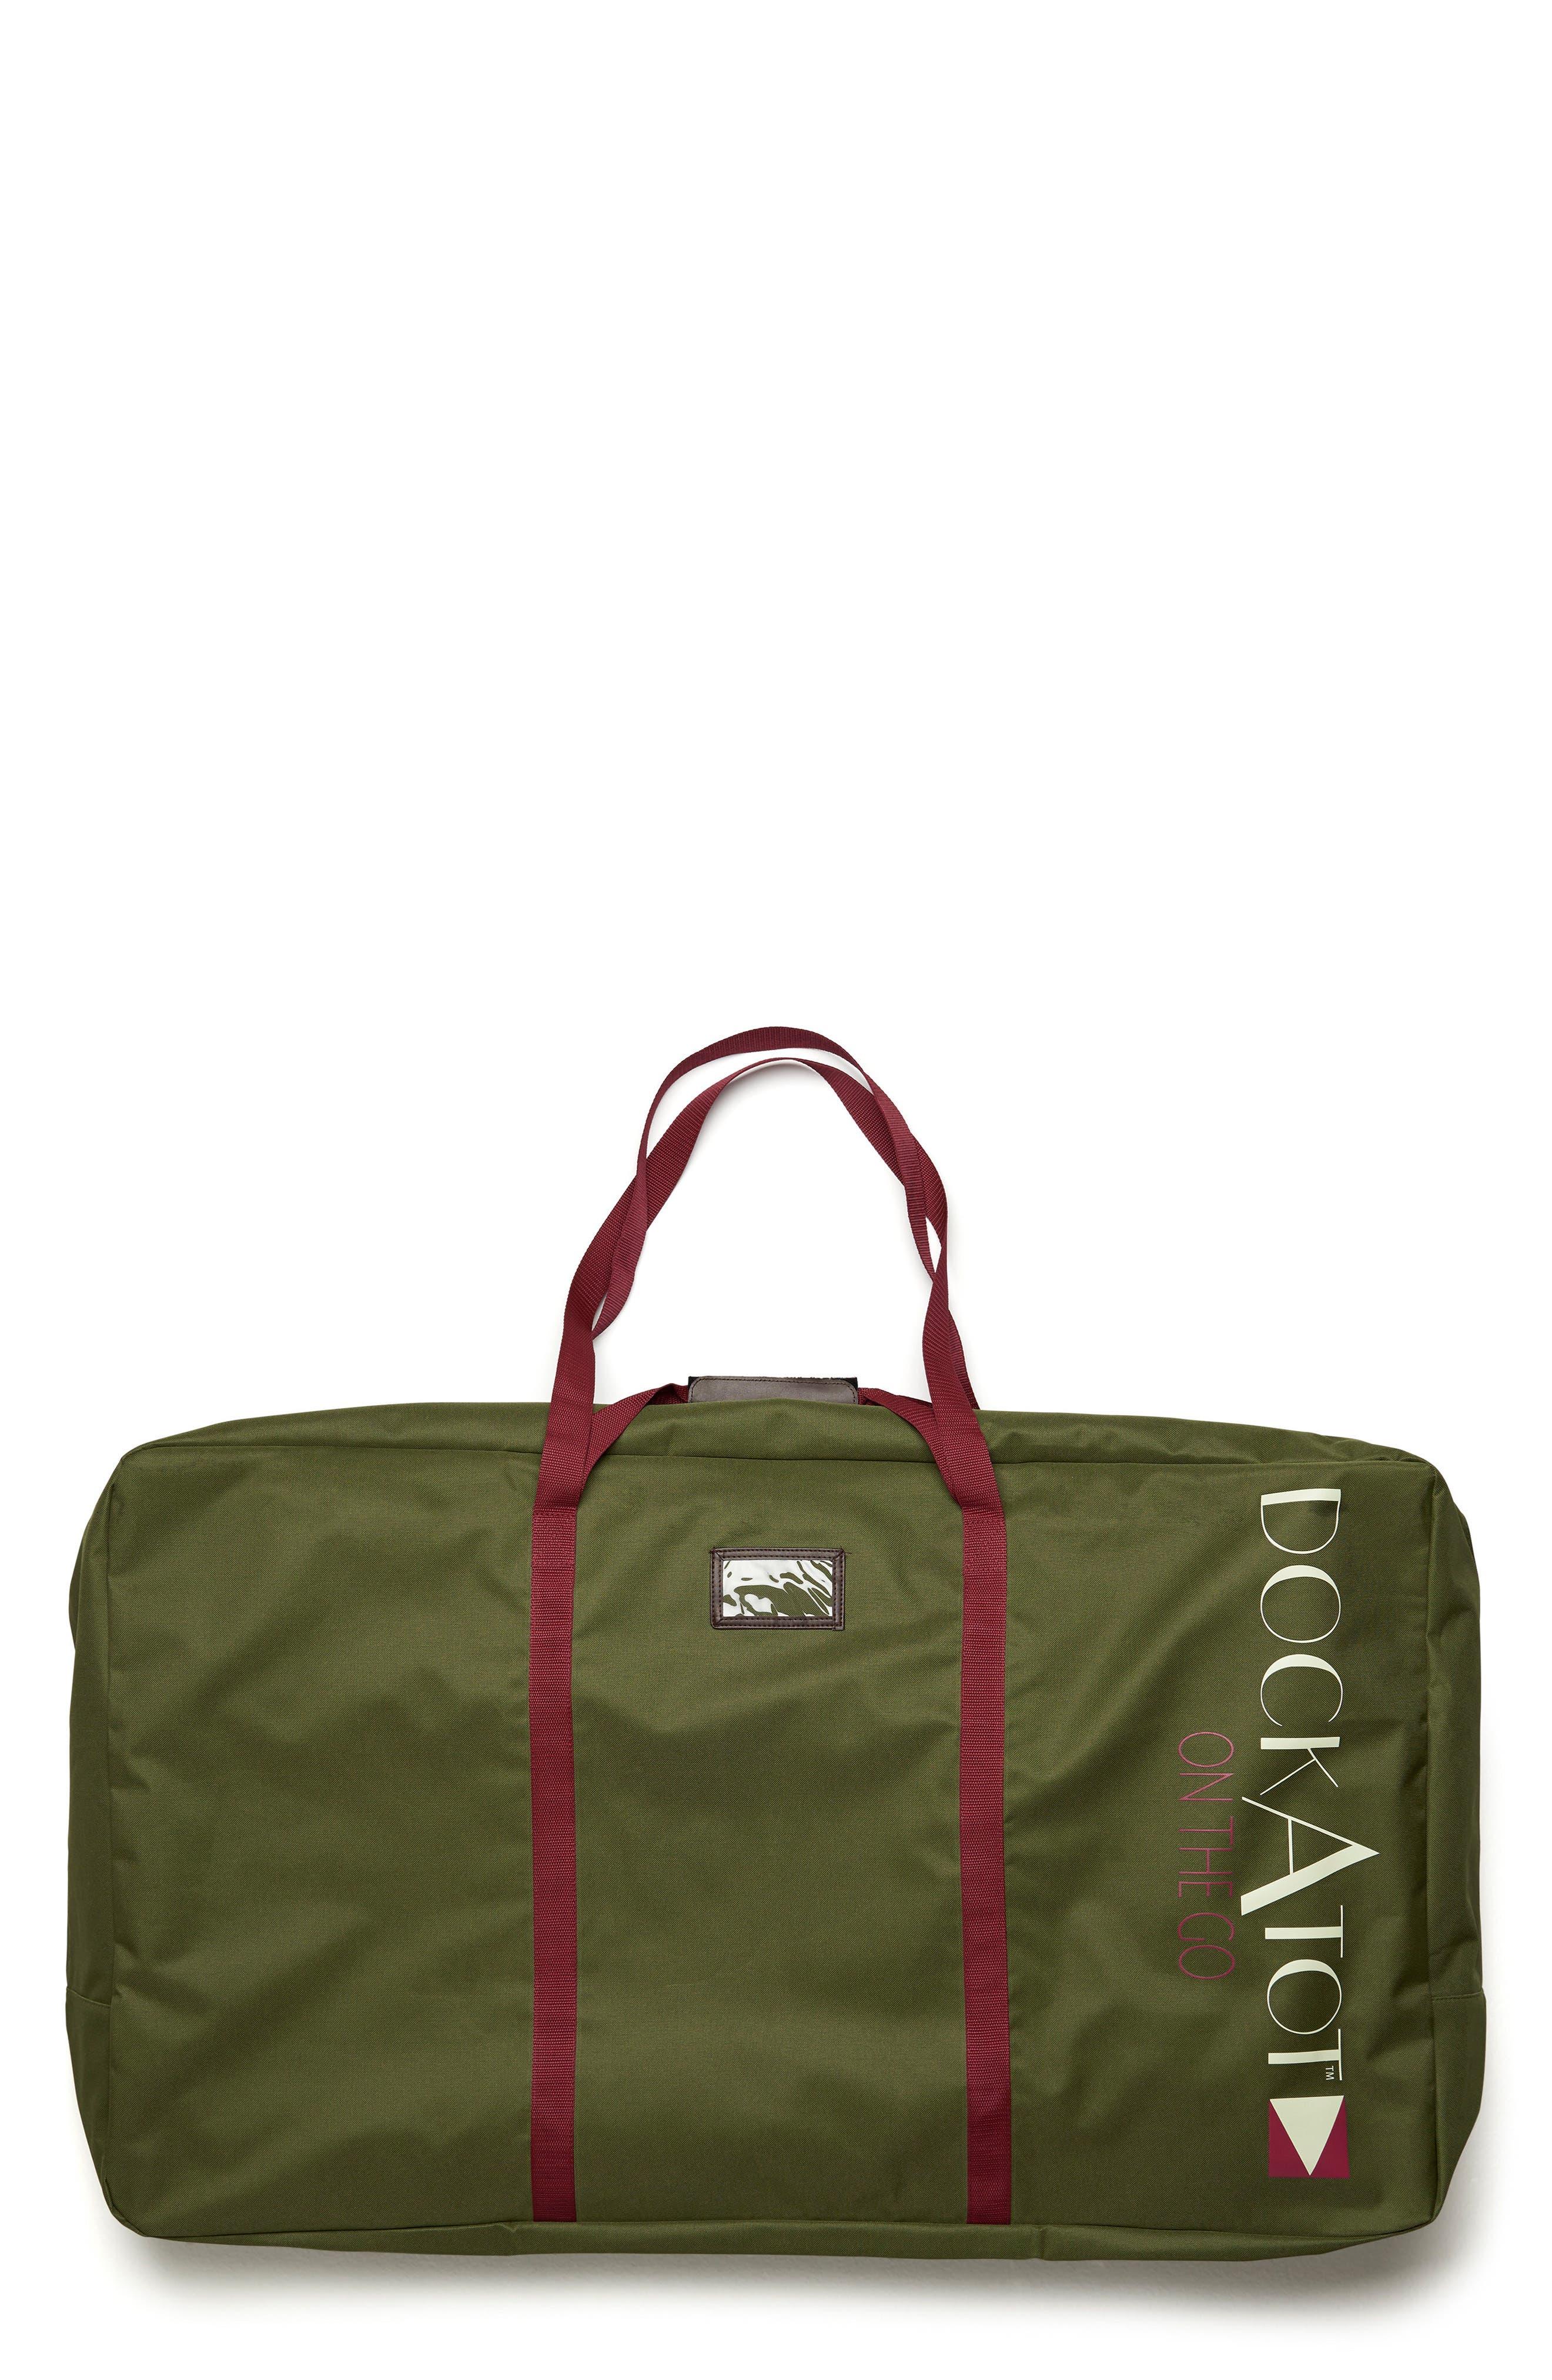 Grand Transport Bag,                             Main thumbnail 1, color,                             MOSS GREEN